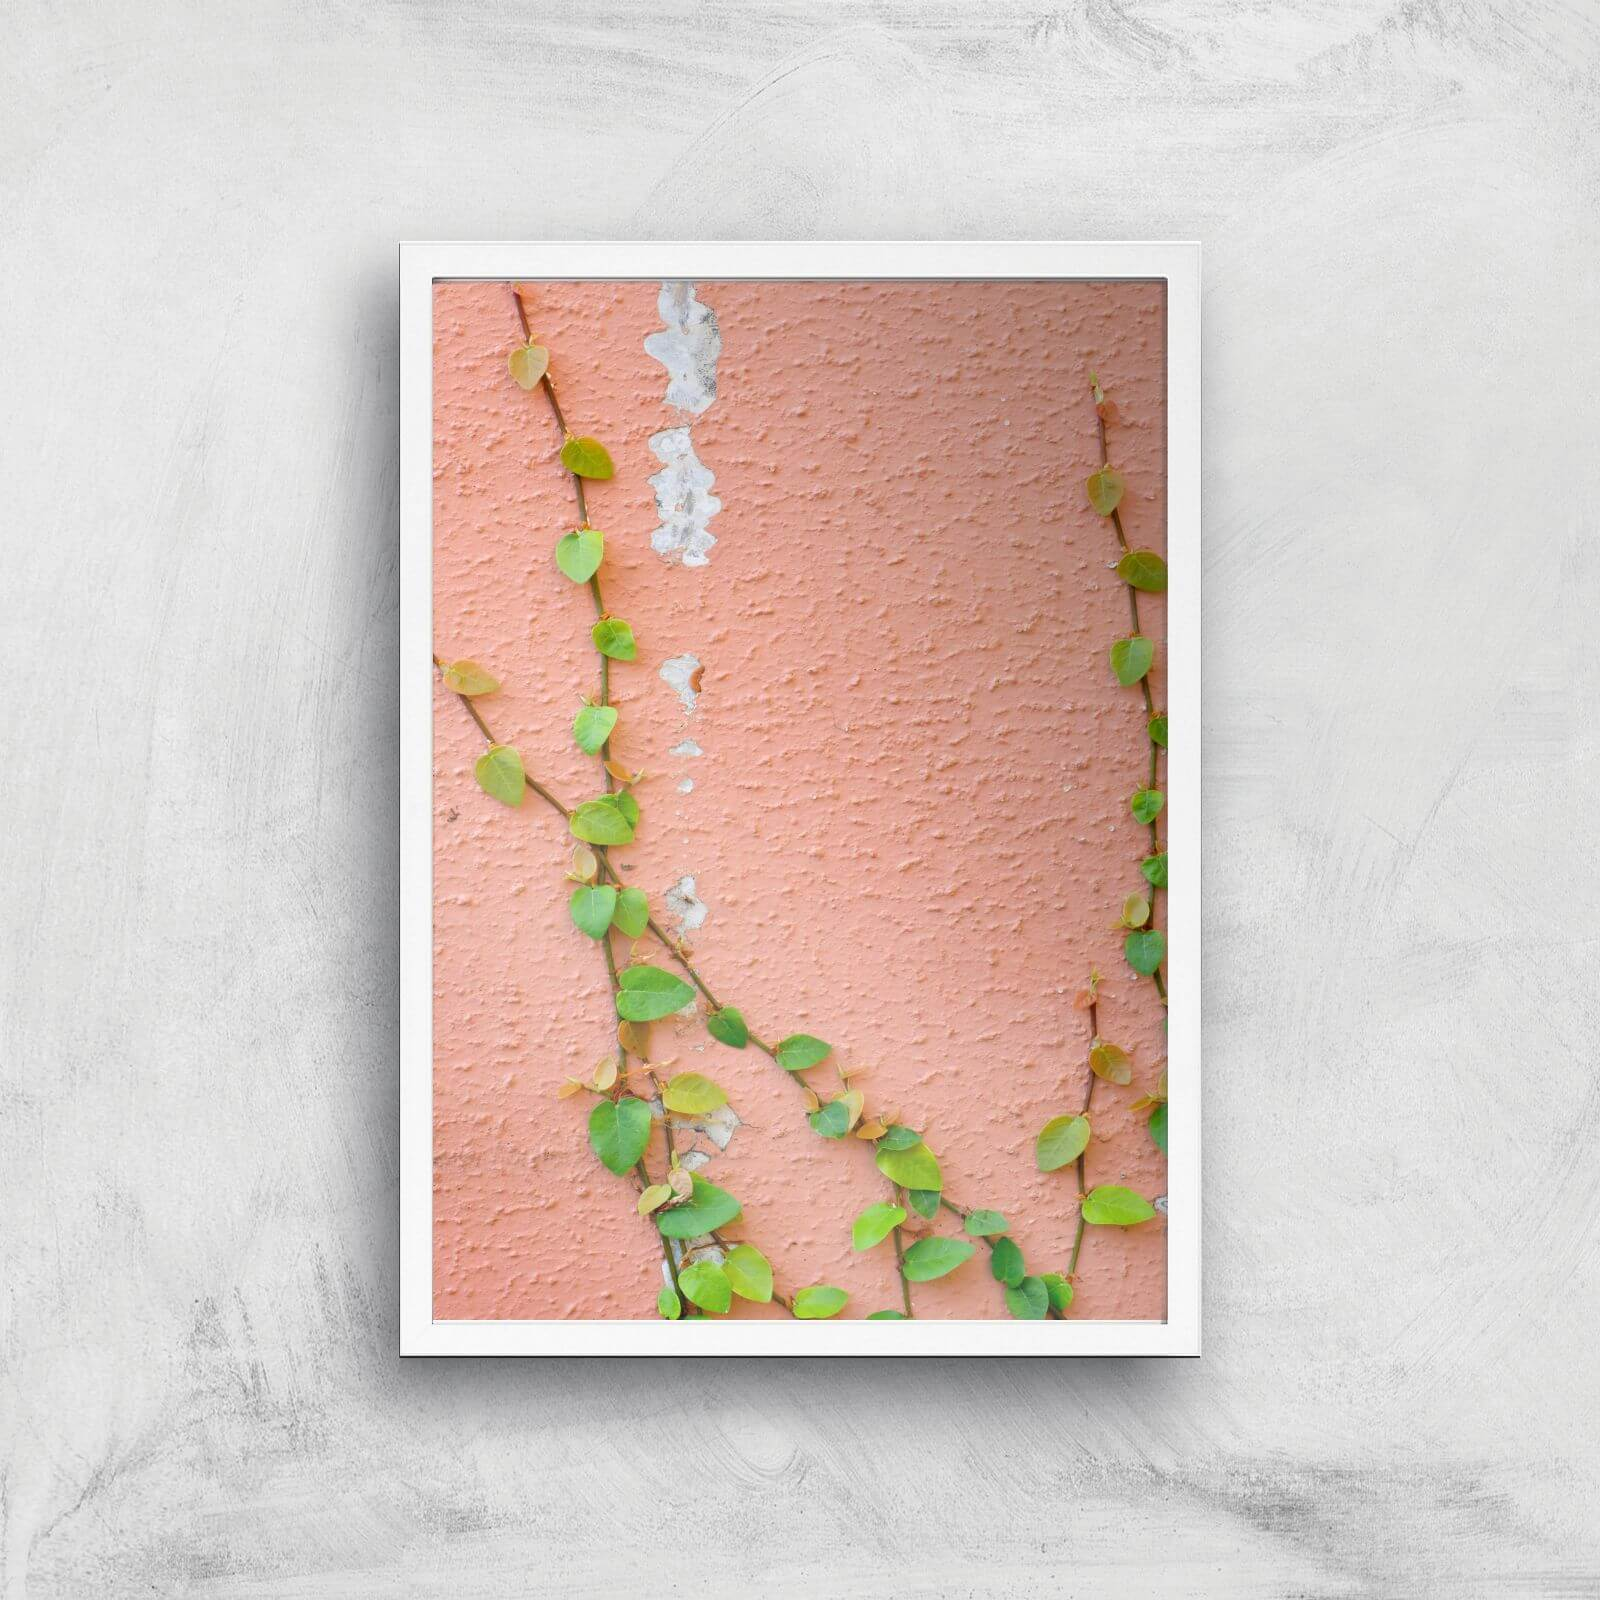 Climbing Ivy Giclee Art Print   A3   White Frame